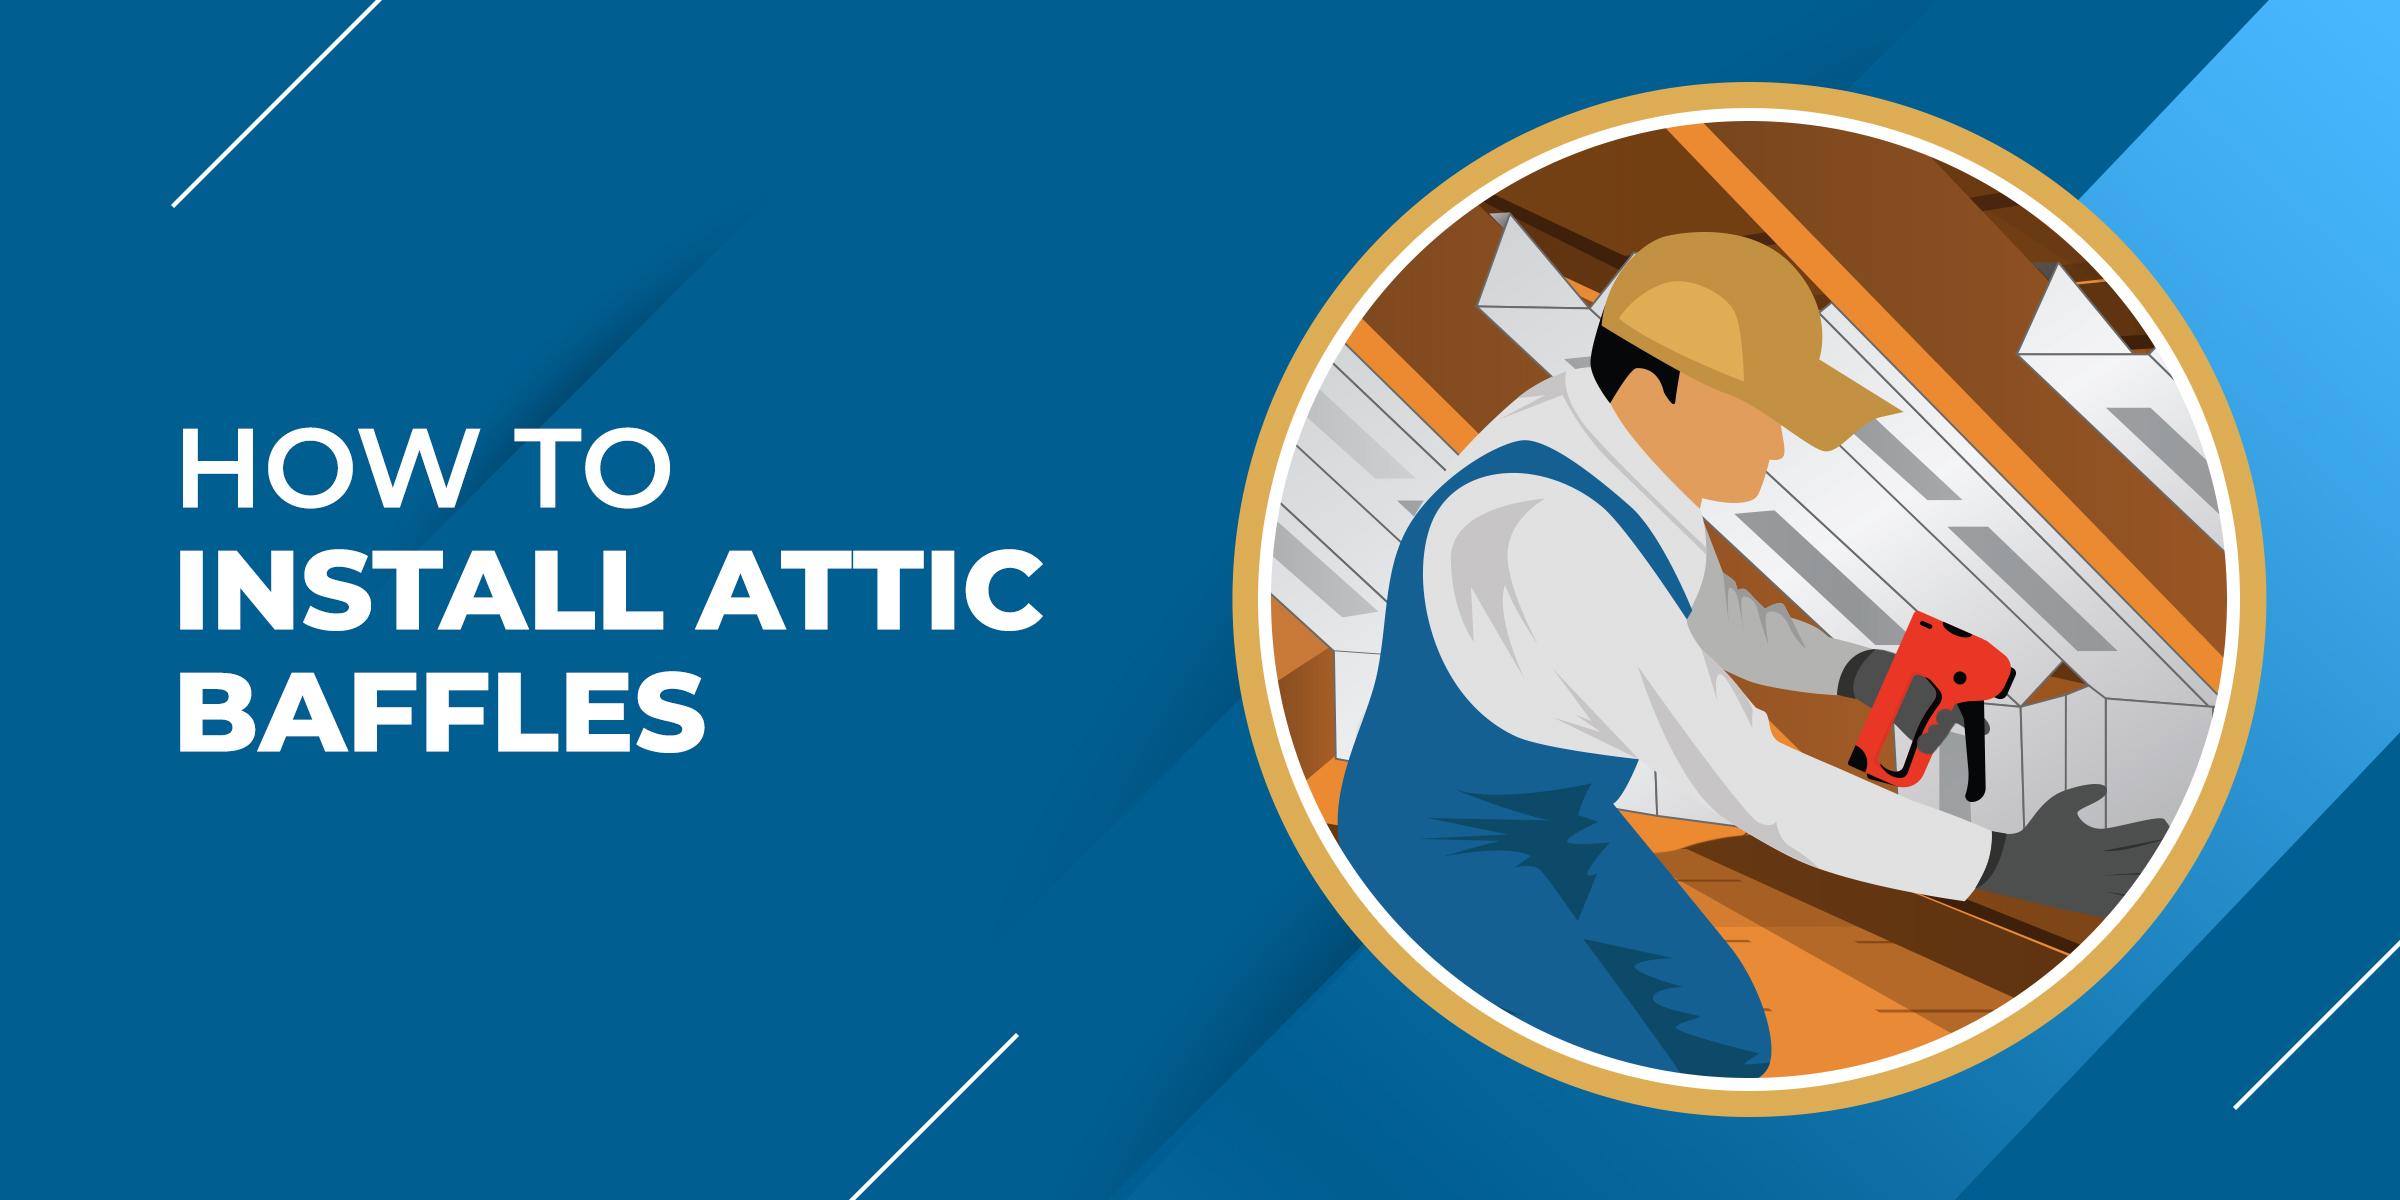 How to Install Attic Baffles